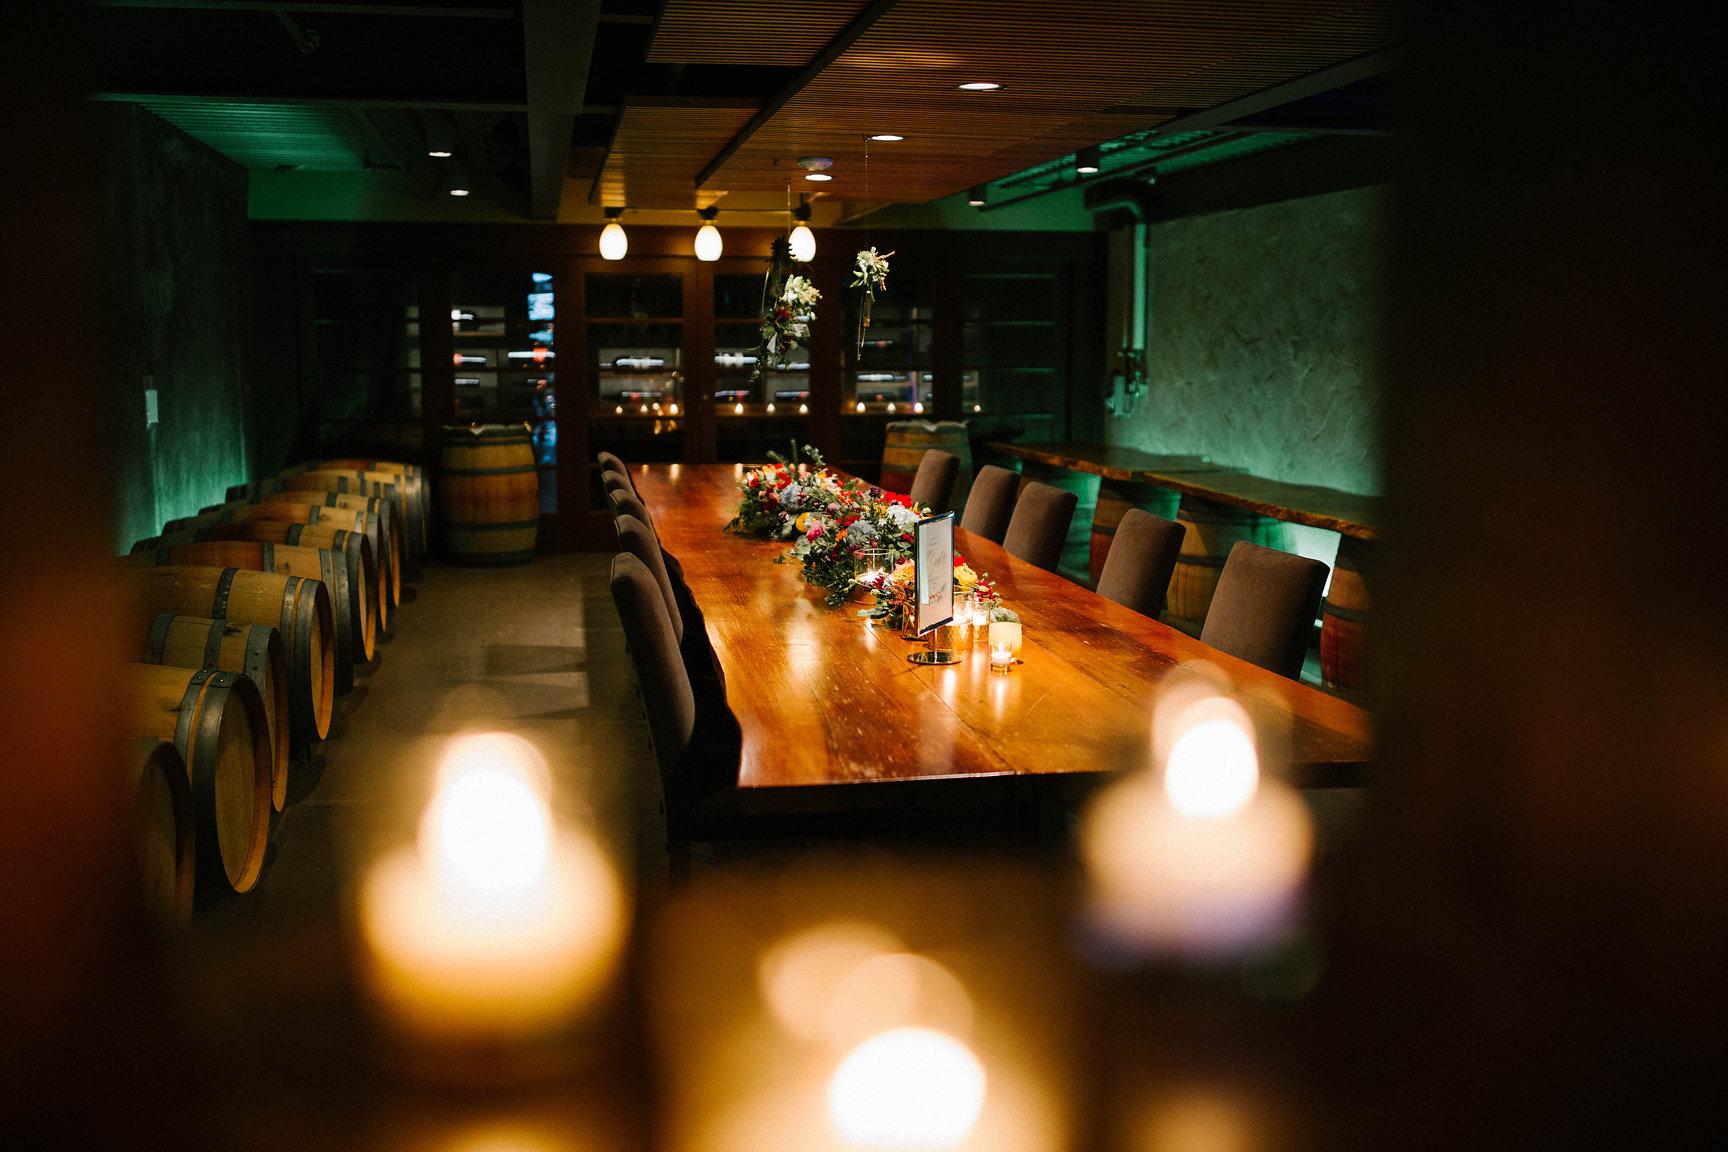 novelty-hill-januik-woodinville-seattle-wedding-venues-Seattle-photographer-adina-preston-weddings-in-woodinville-2017-2.jpg